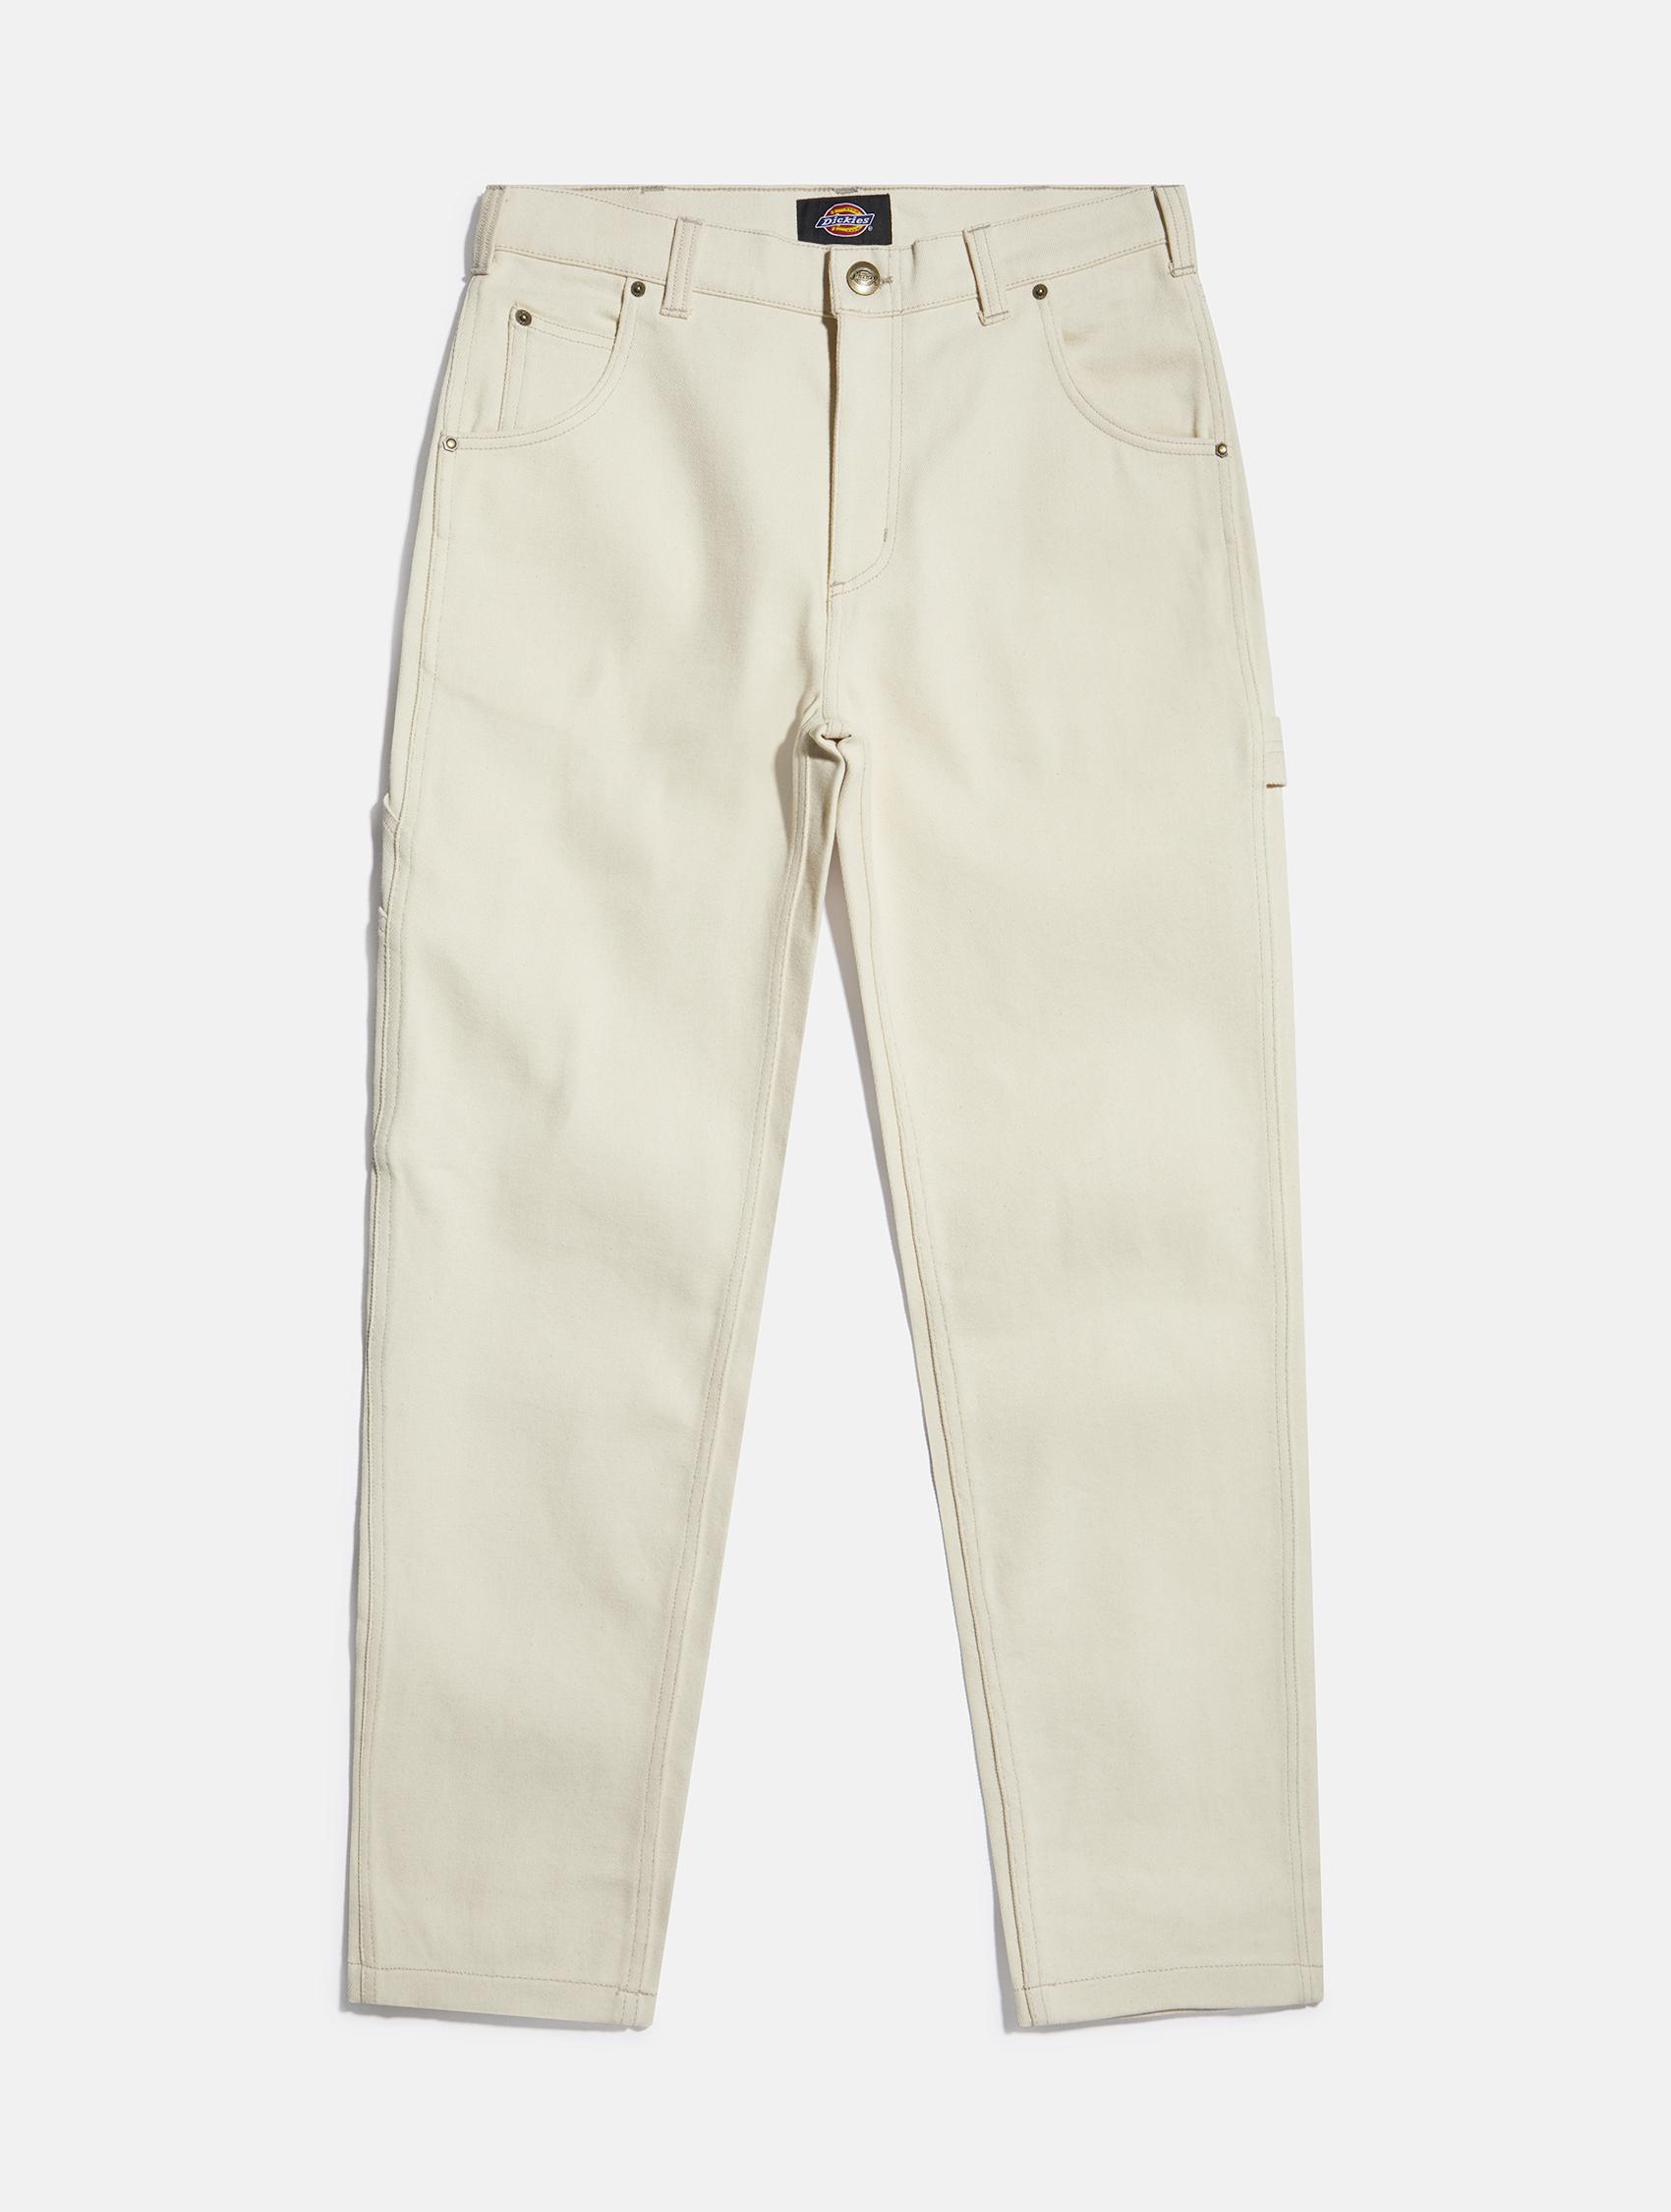 White denim jeans by Dickies